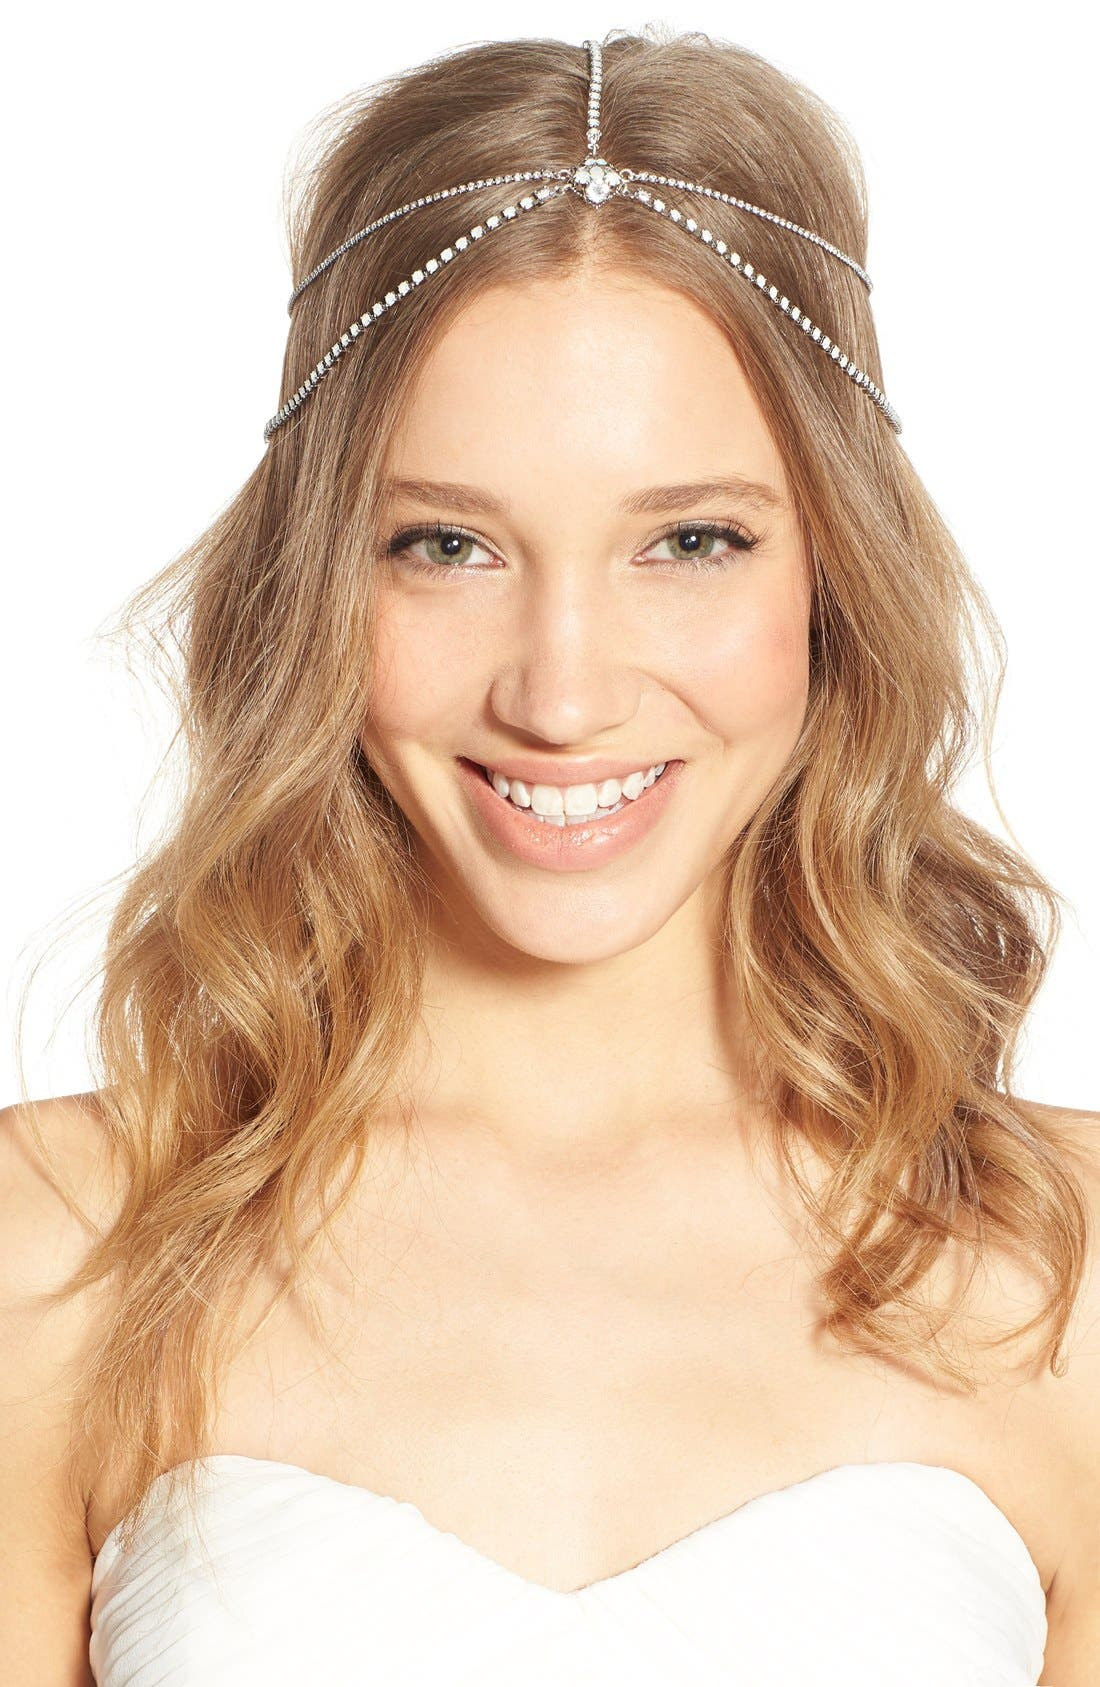 Sara Gabriel 'Lindsay' Embellished Hair Chain